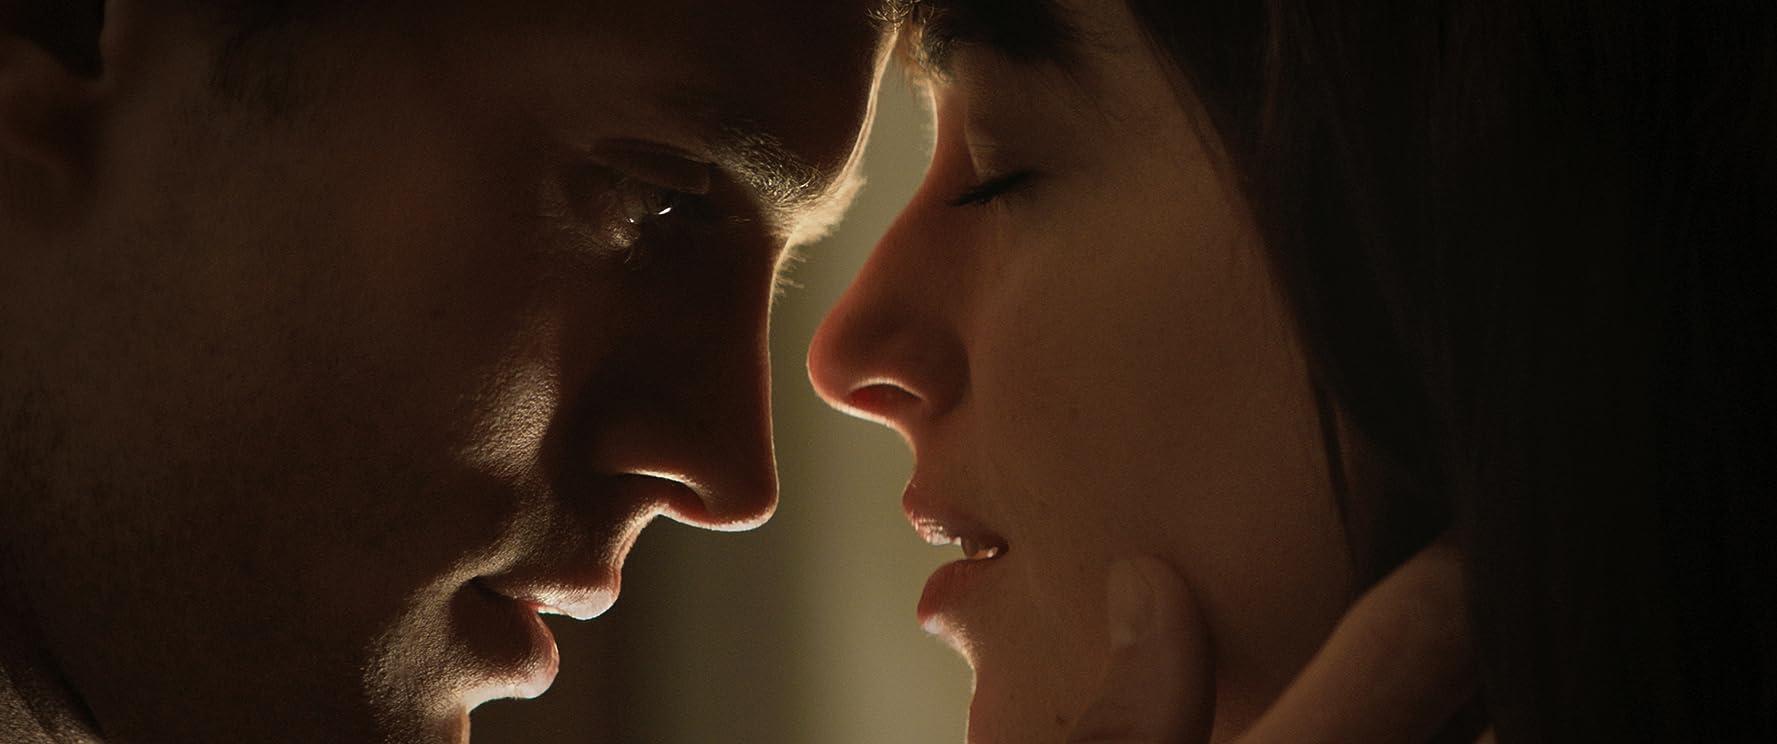 Dakota Johnson and Jamie Dornan in Fifty Shades of Grey (2015)